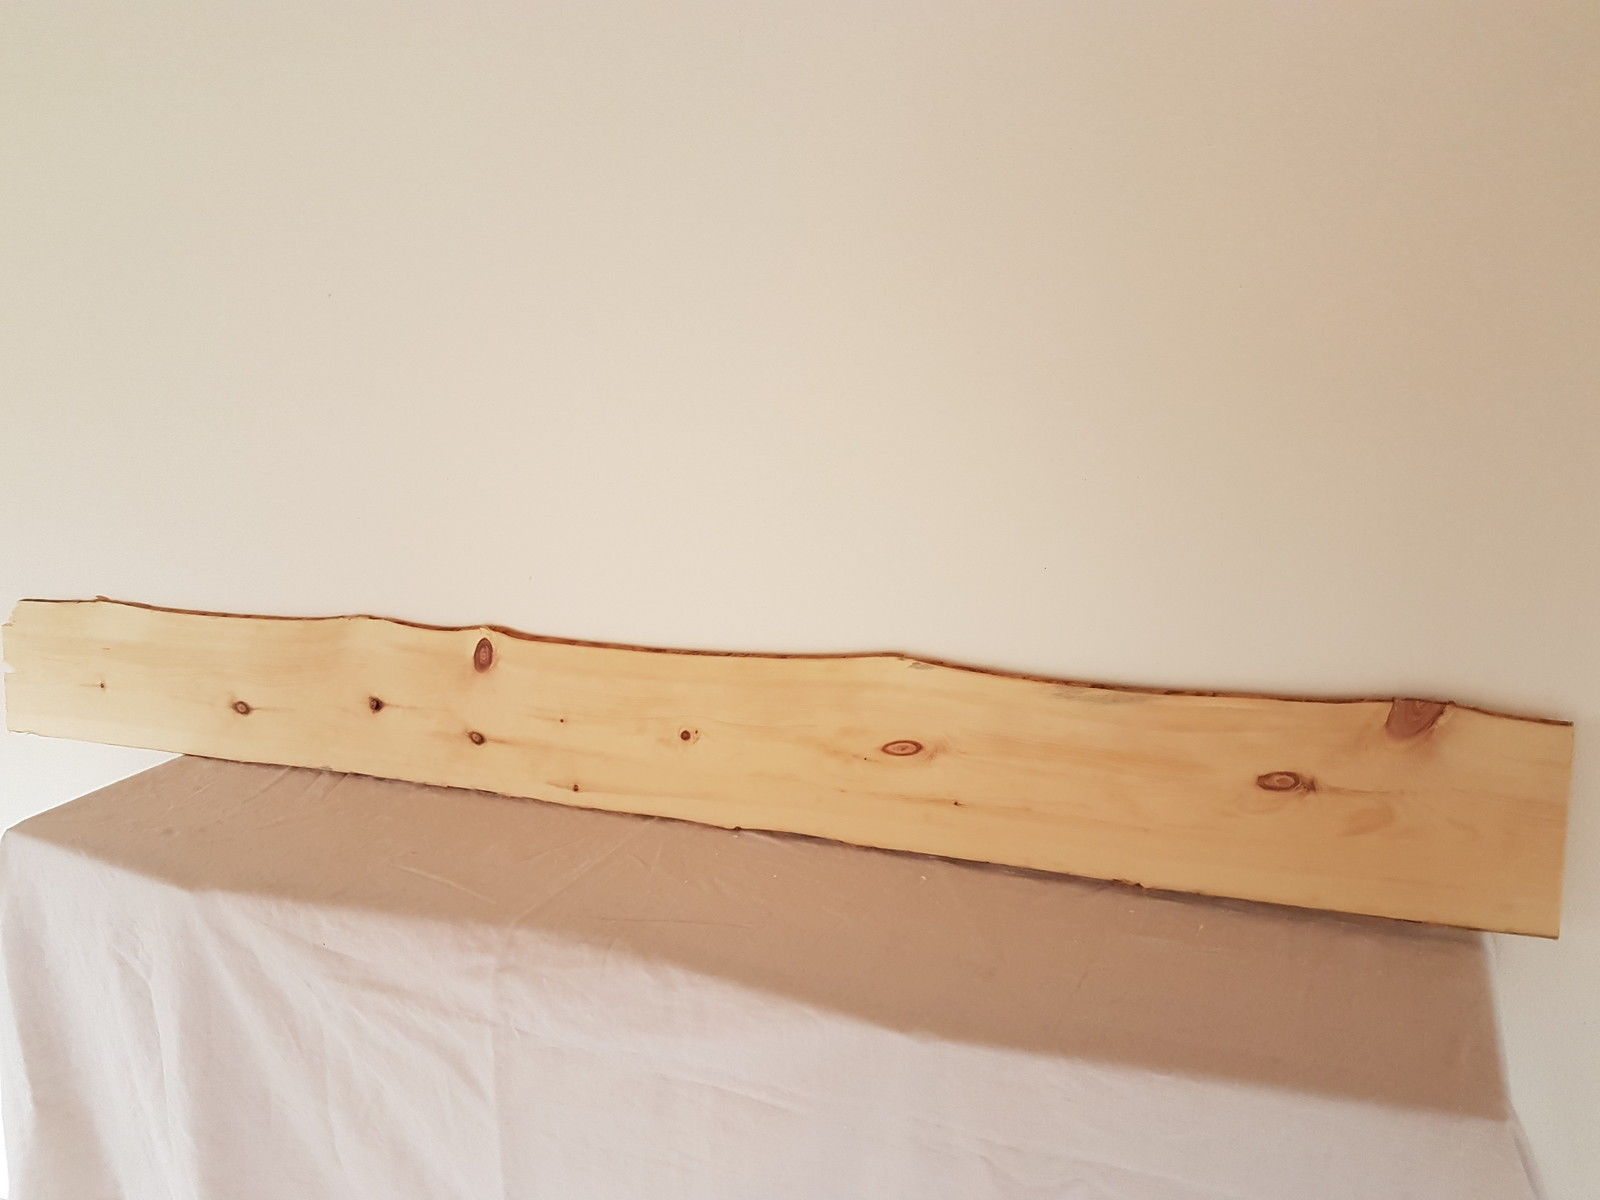 zirbenholz bettdecken bettdecken hse bettw sche 200x220 g nstig d nisches bettenlager. Black Bedroom Furniture Sets. Home Design Ideas